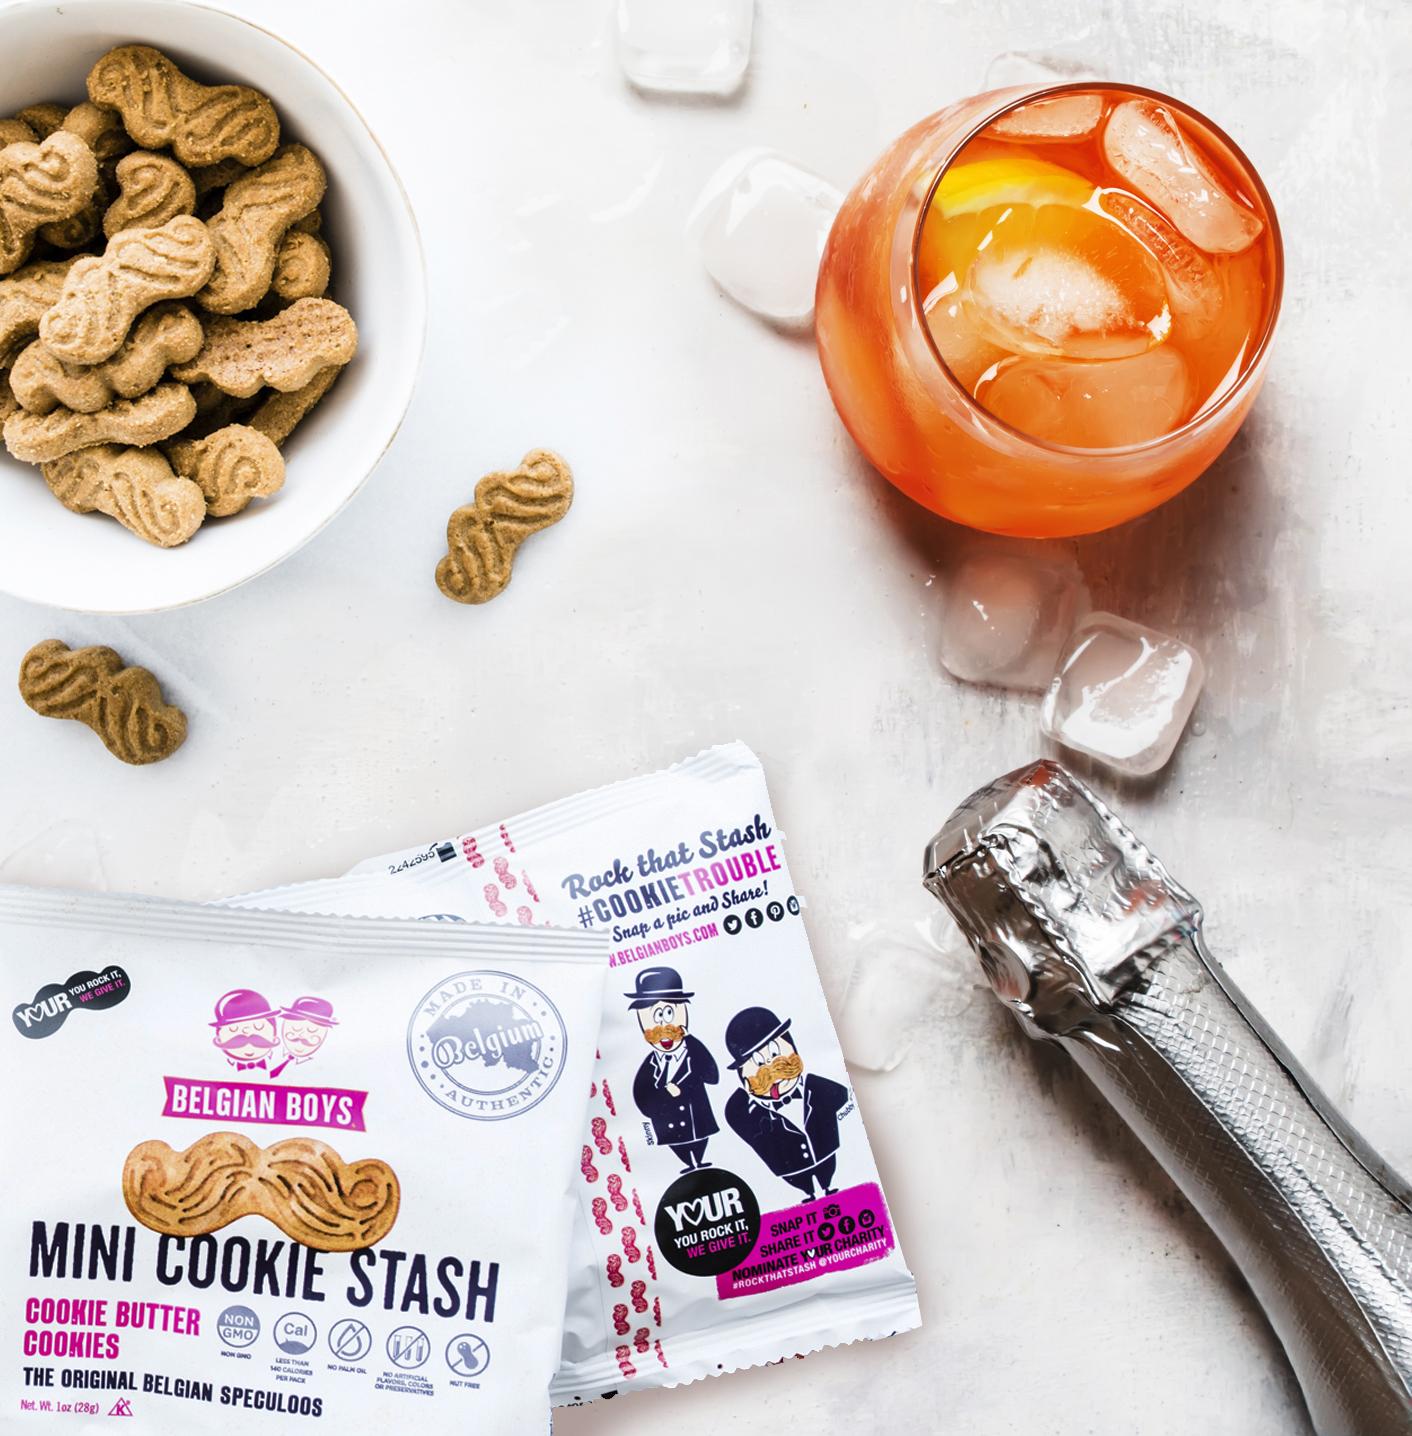 belgian_boys_mini_cookie_stash